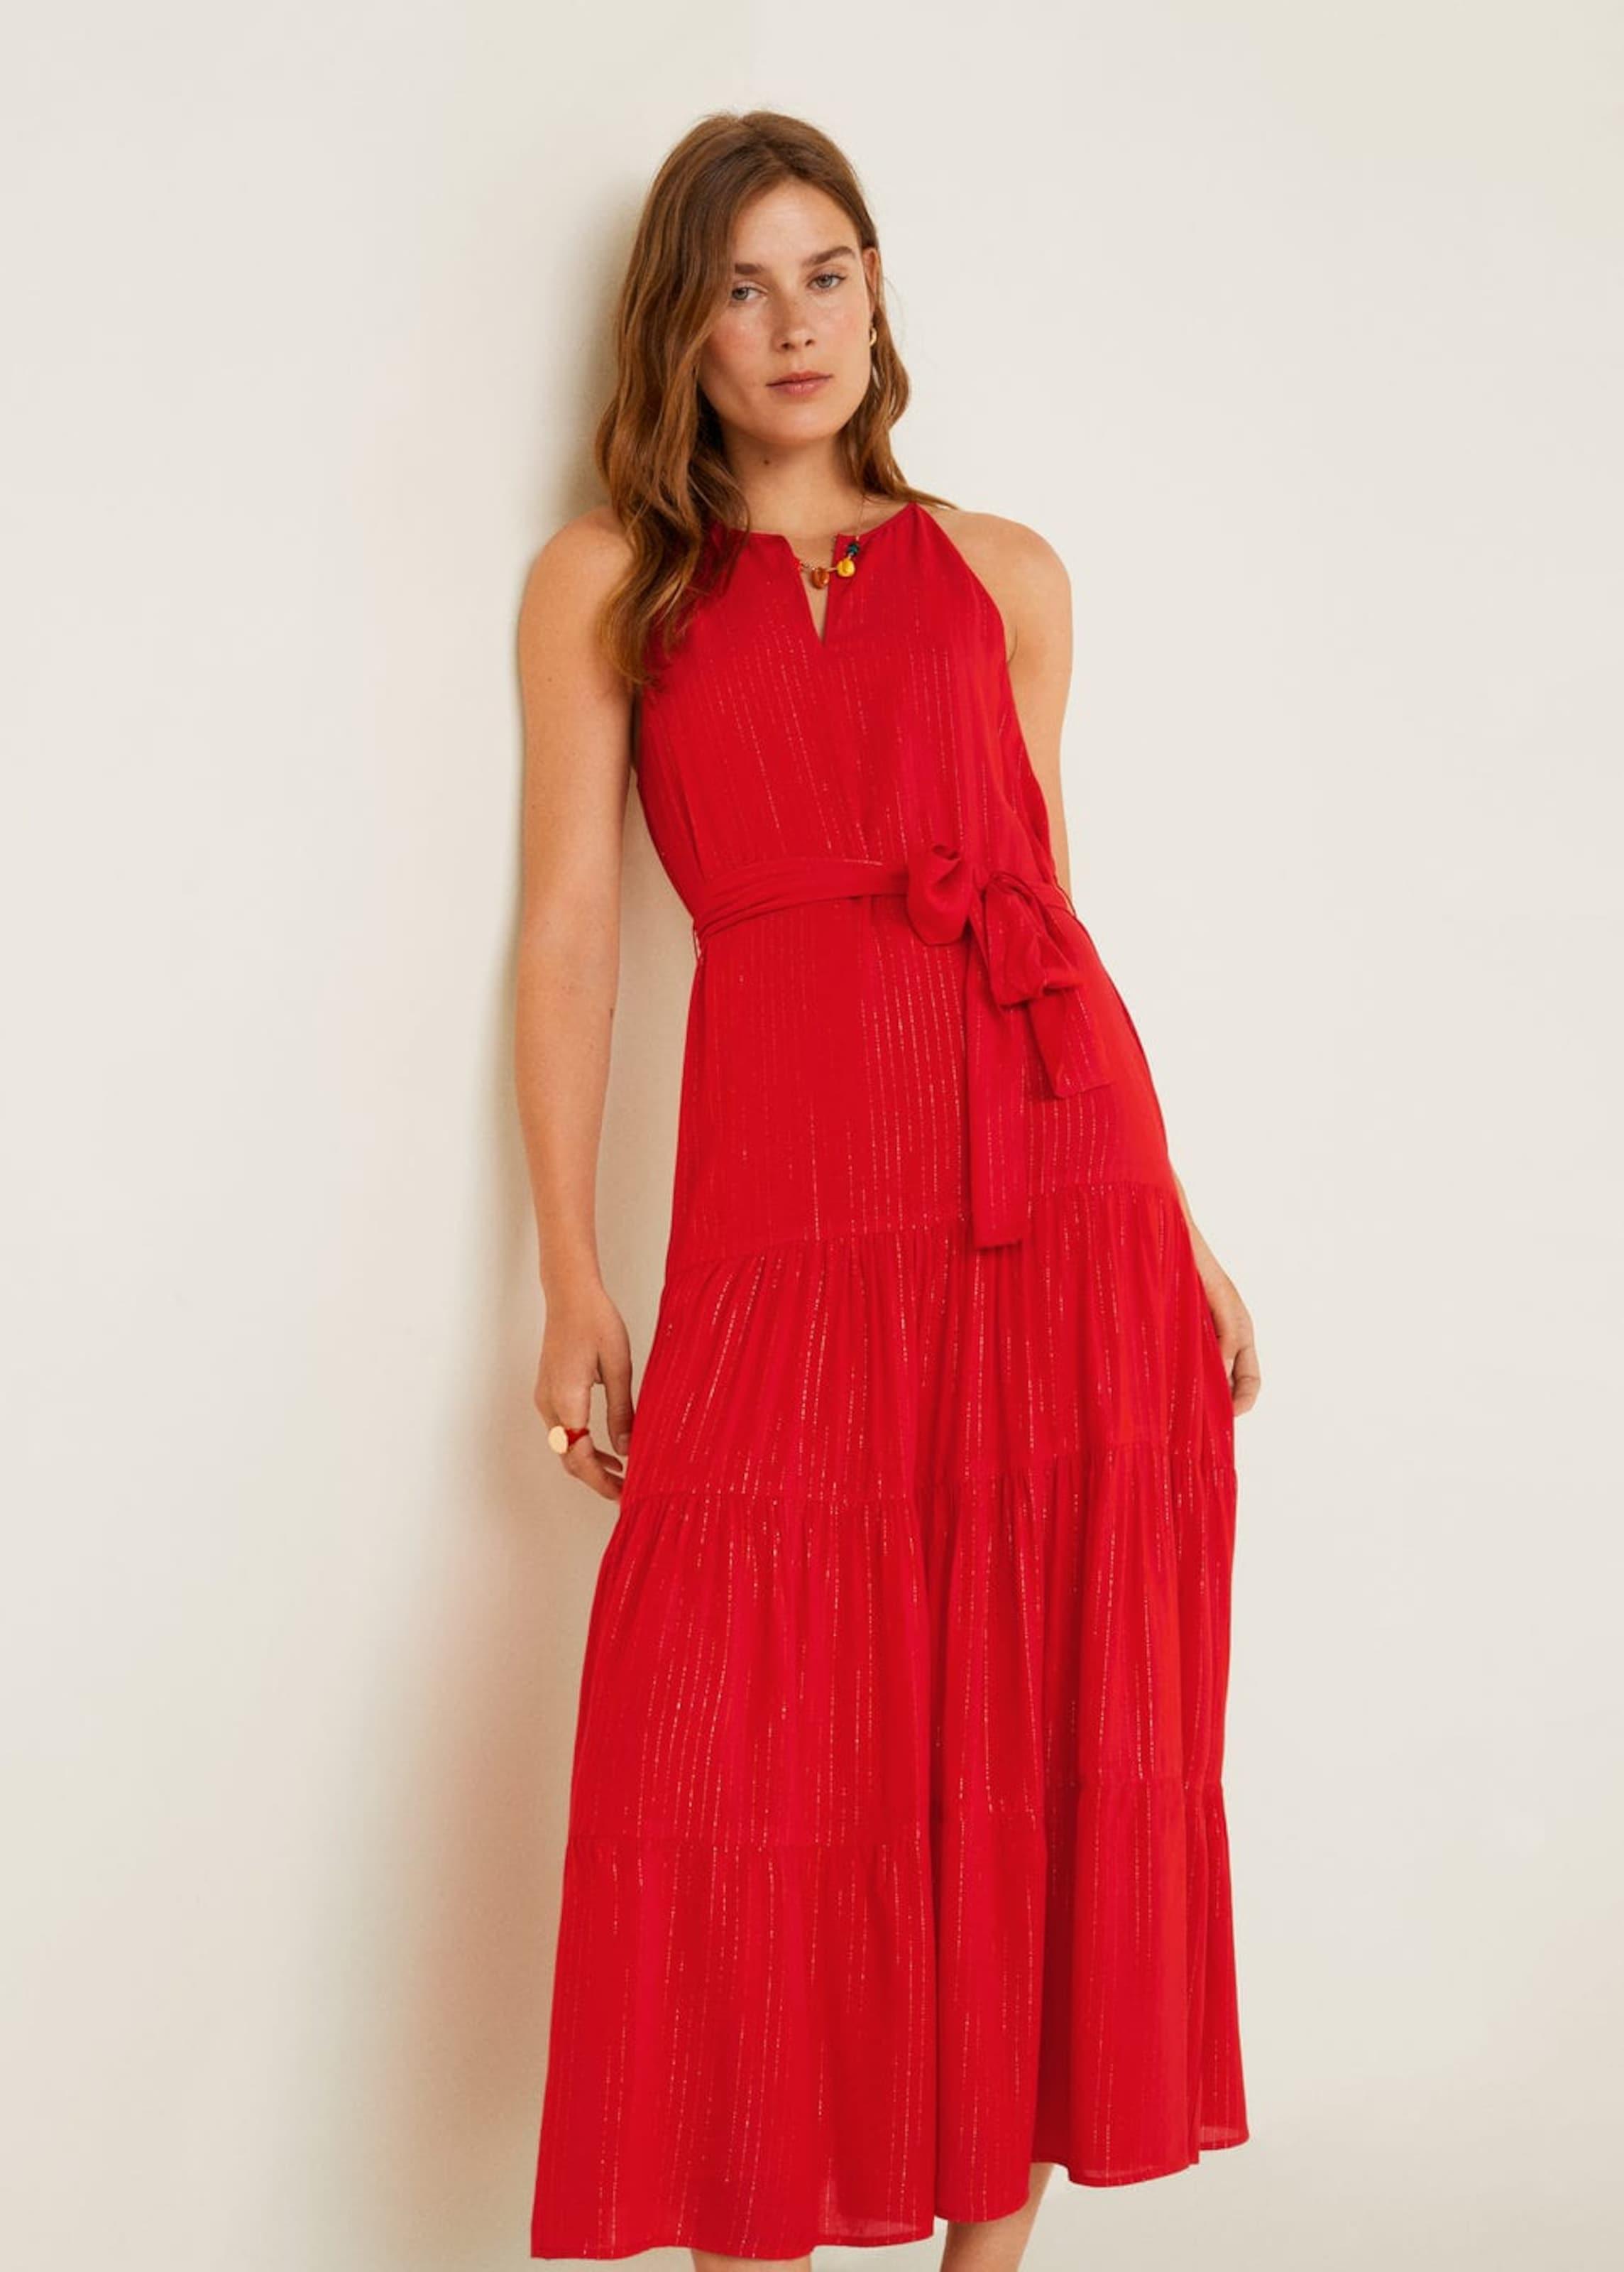 Mango Mango 'rojito' Kleid In Kleid 'rojito' Rot OmN0yvnw8